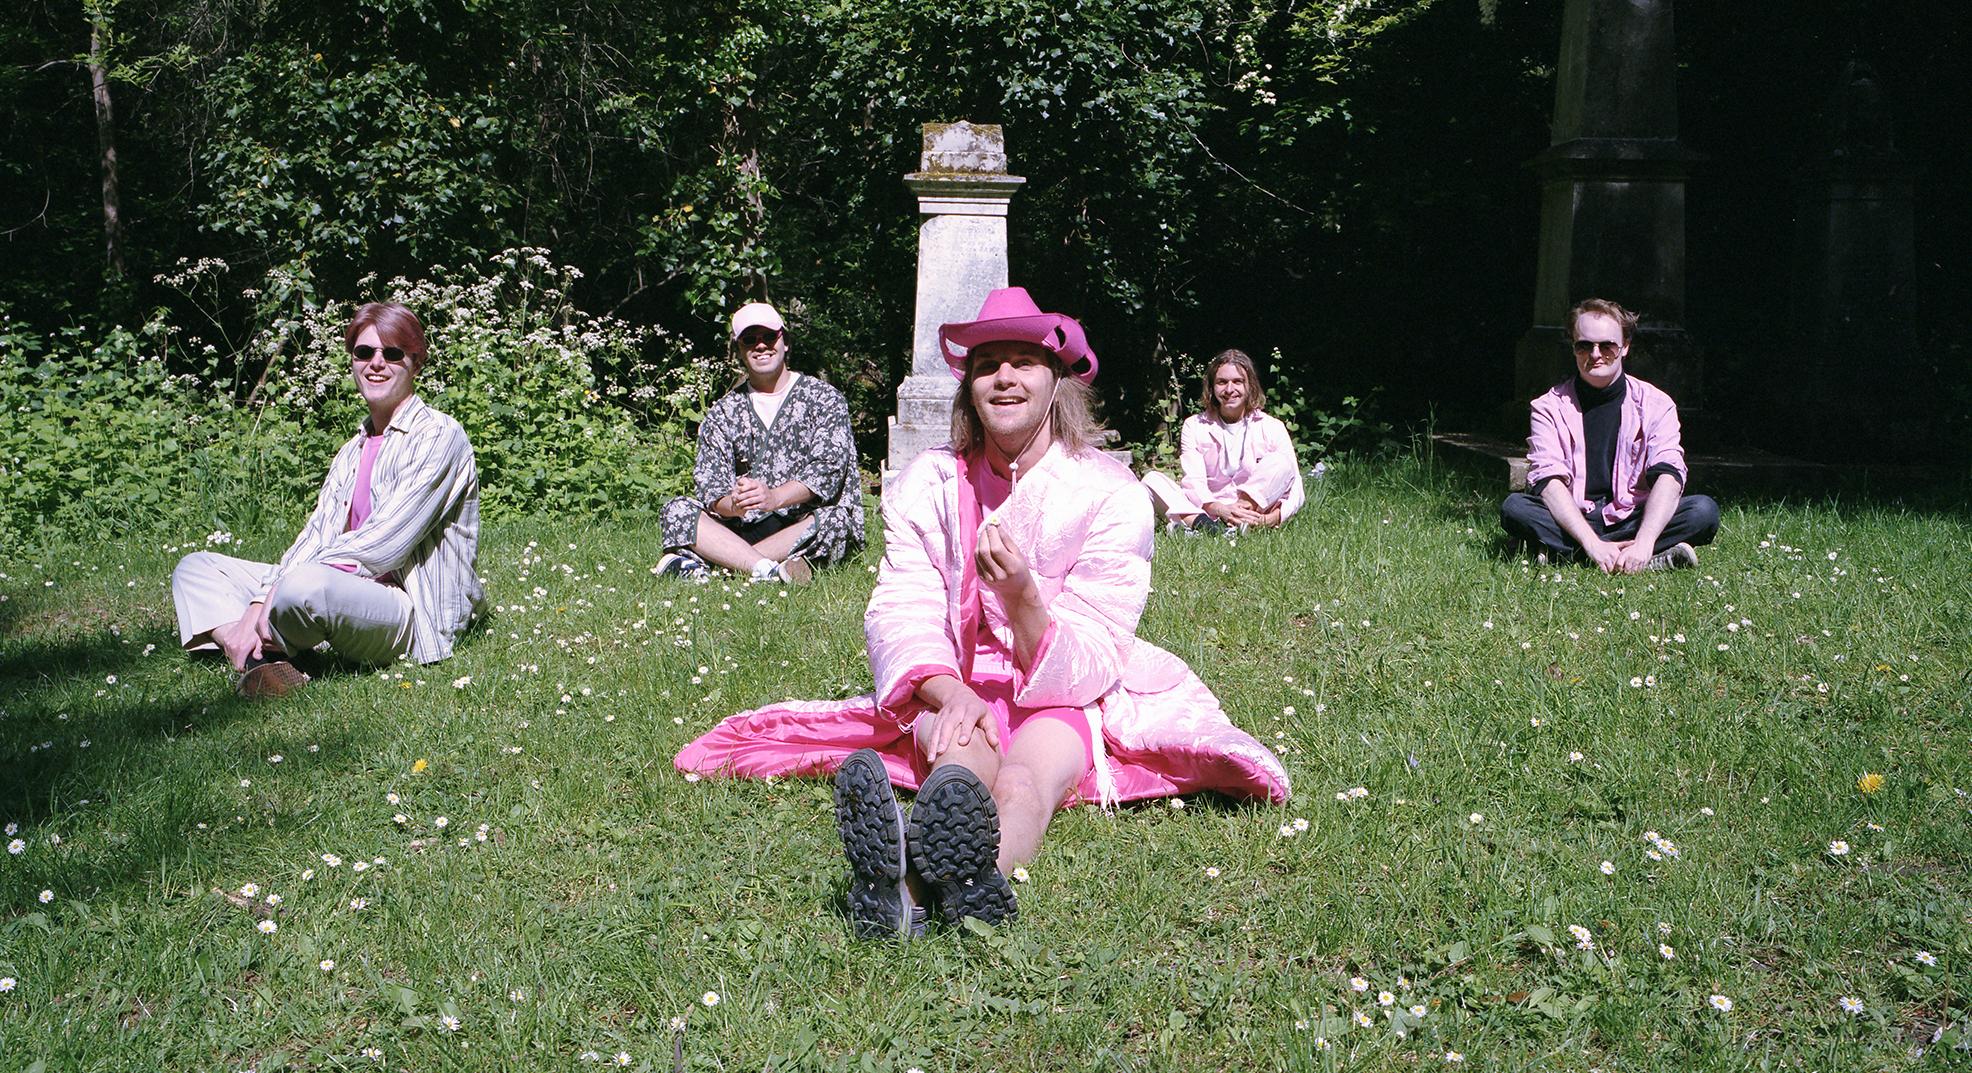 premier album depressif en rose fluo